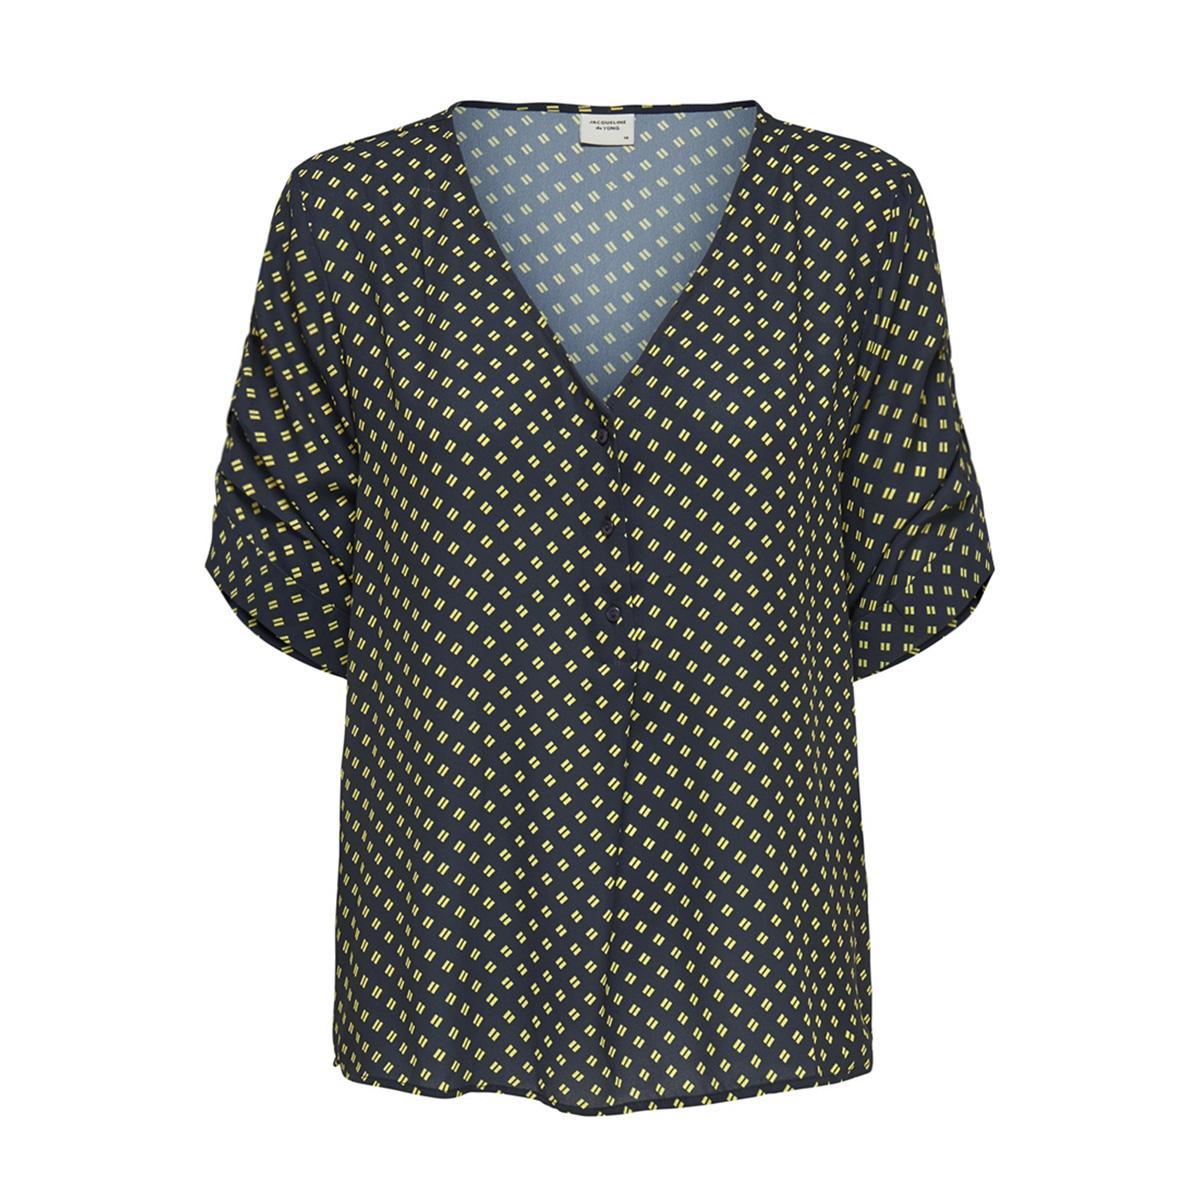 jdyinnes 2/4 top wvn 15169638 jacqueline de yong blouse sky captain/green shee